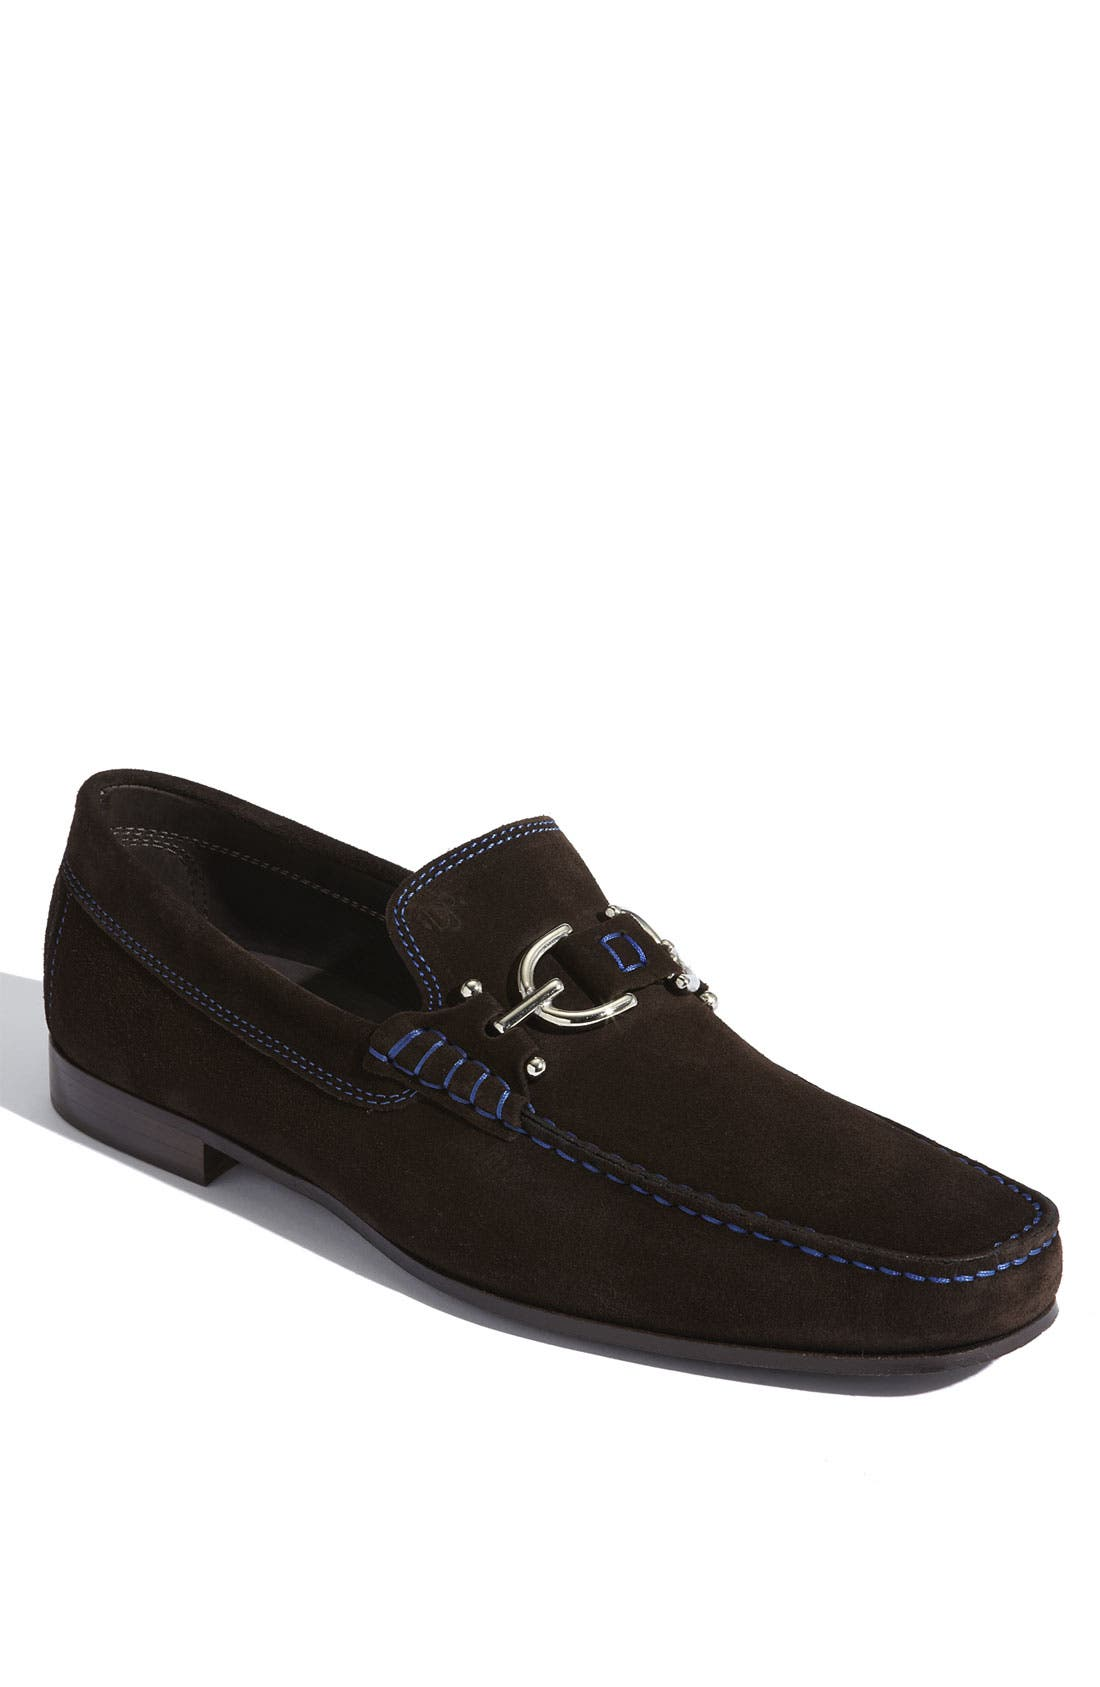 Donald Pliner Dacio II Loafer (Men)